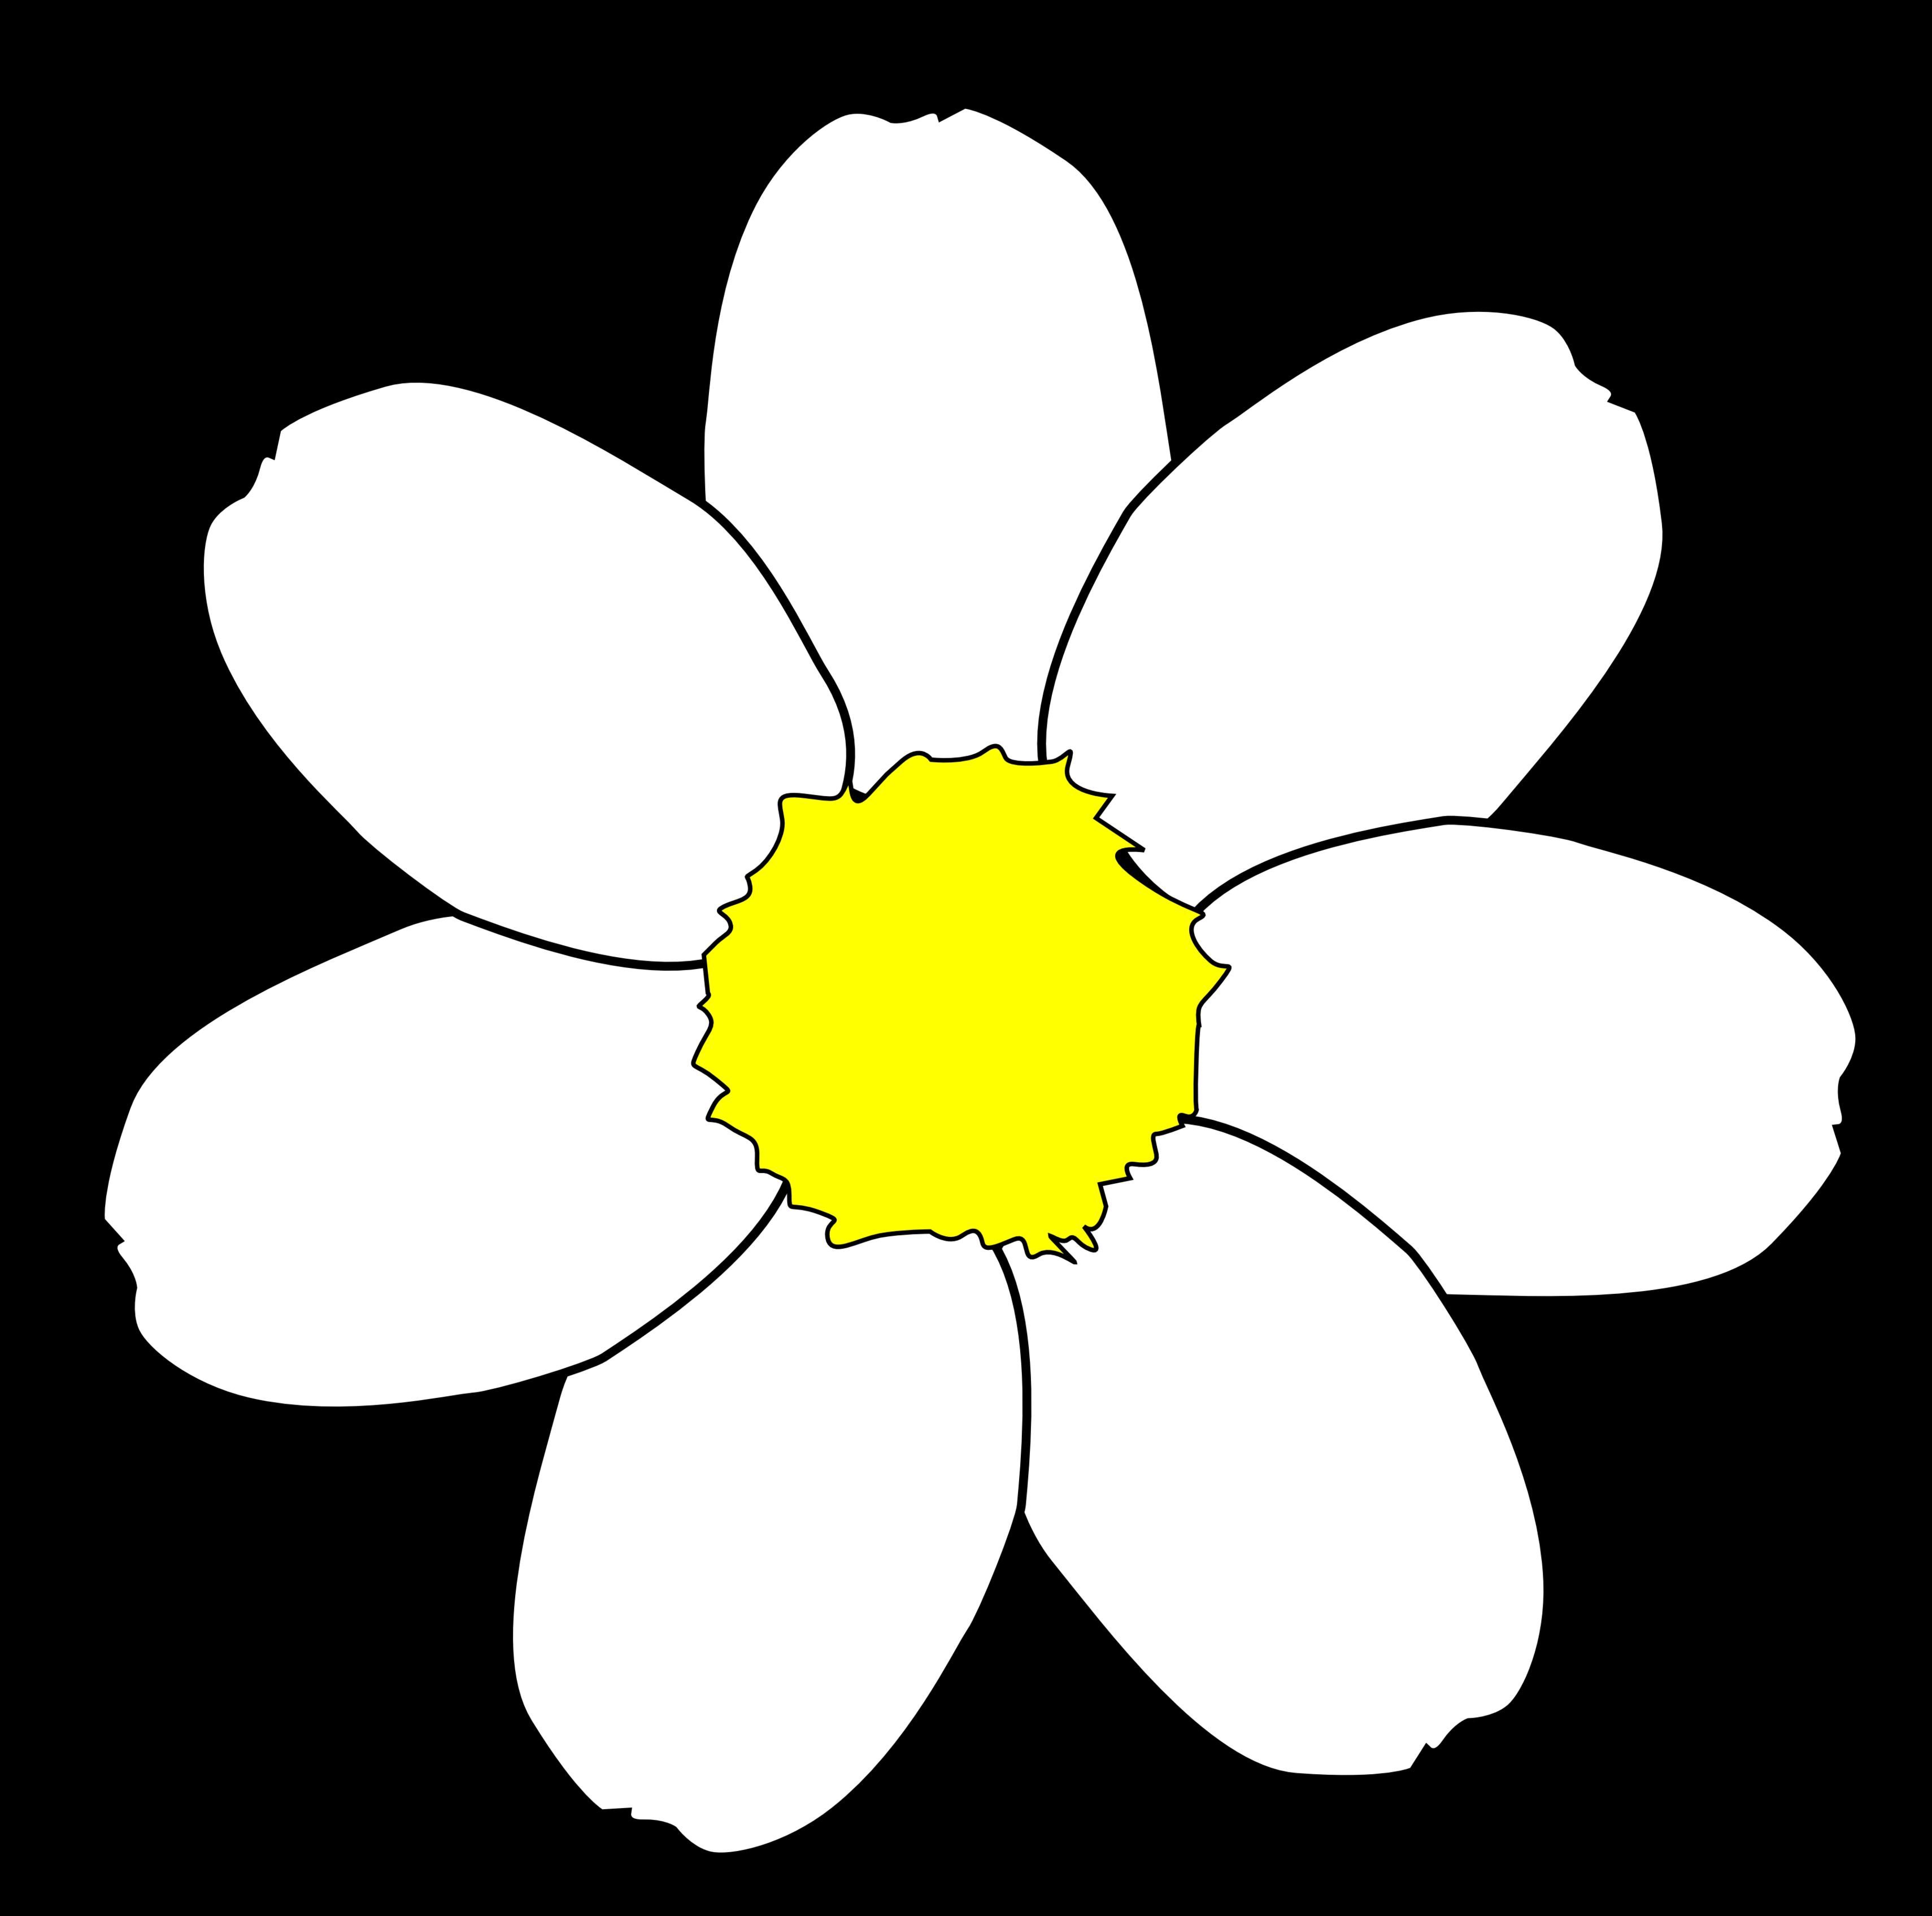 Daisy clipart daisy chain. Petal flower free collection